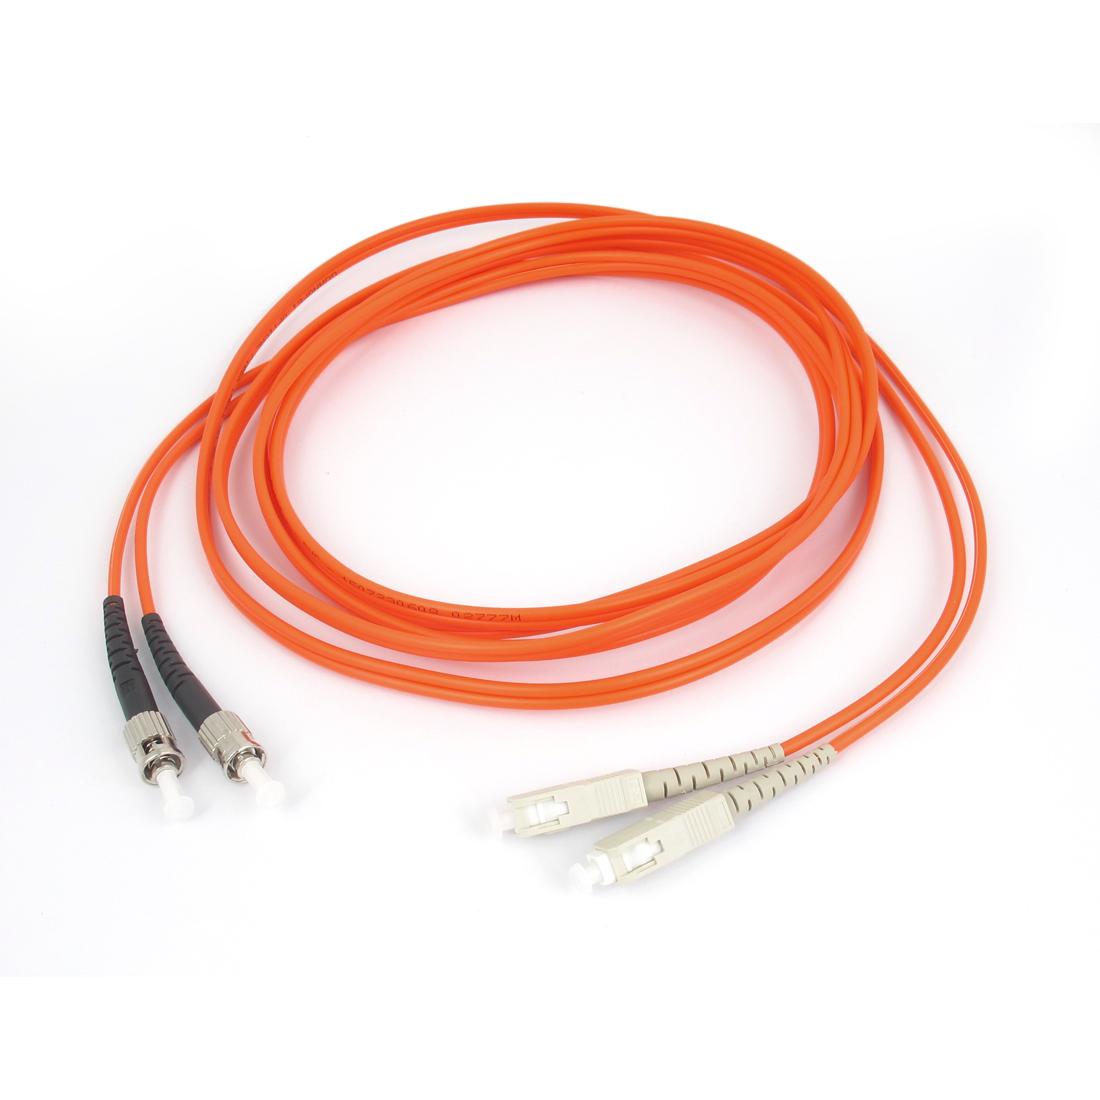 Jumper Cable Duplex Multimode ST-SC Fiber Optic Patch Cord 3 Meters Orange